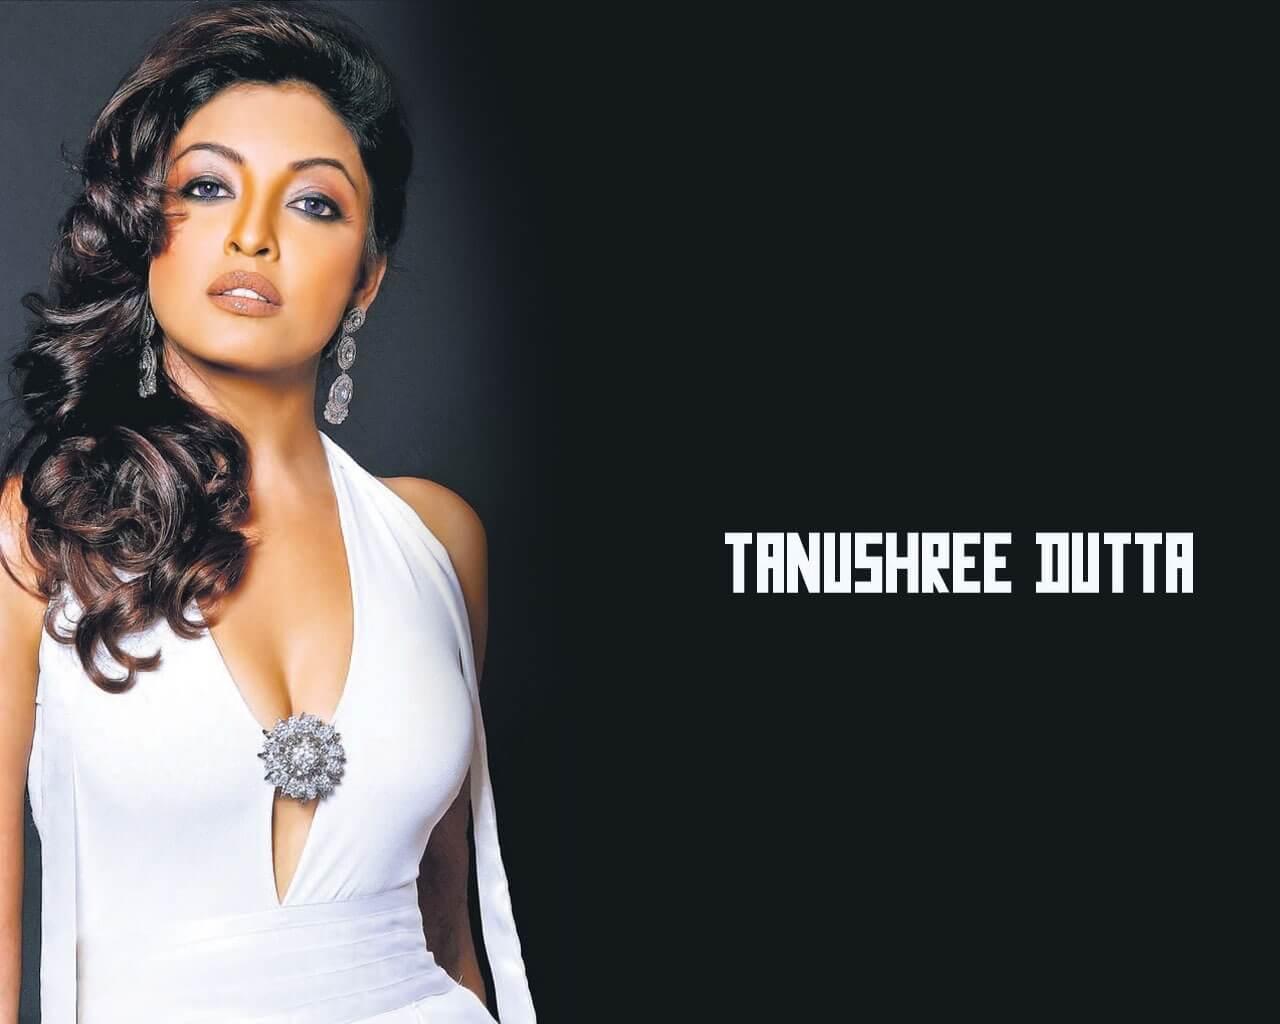 Tanushree Dutta Age, Sister, Latest News, Husband, Family, Net Worth, Height, Image(photo), Birthday, Biography, Married, Education, Wiki, Instagram, Twitter, Facebook, Imdb (4) (1)